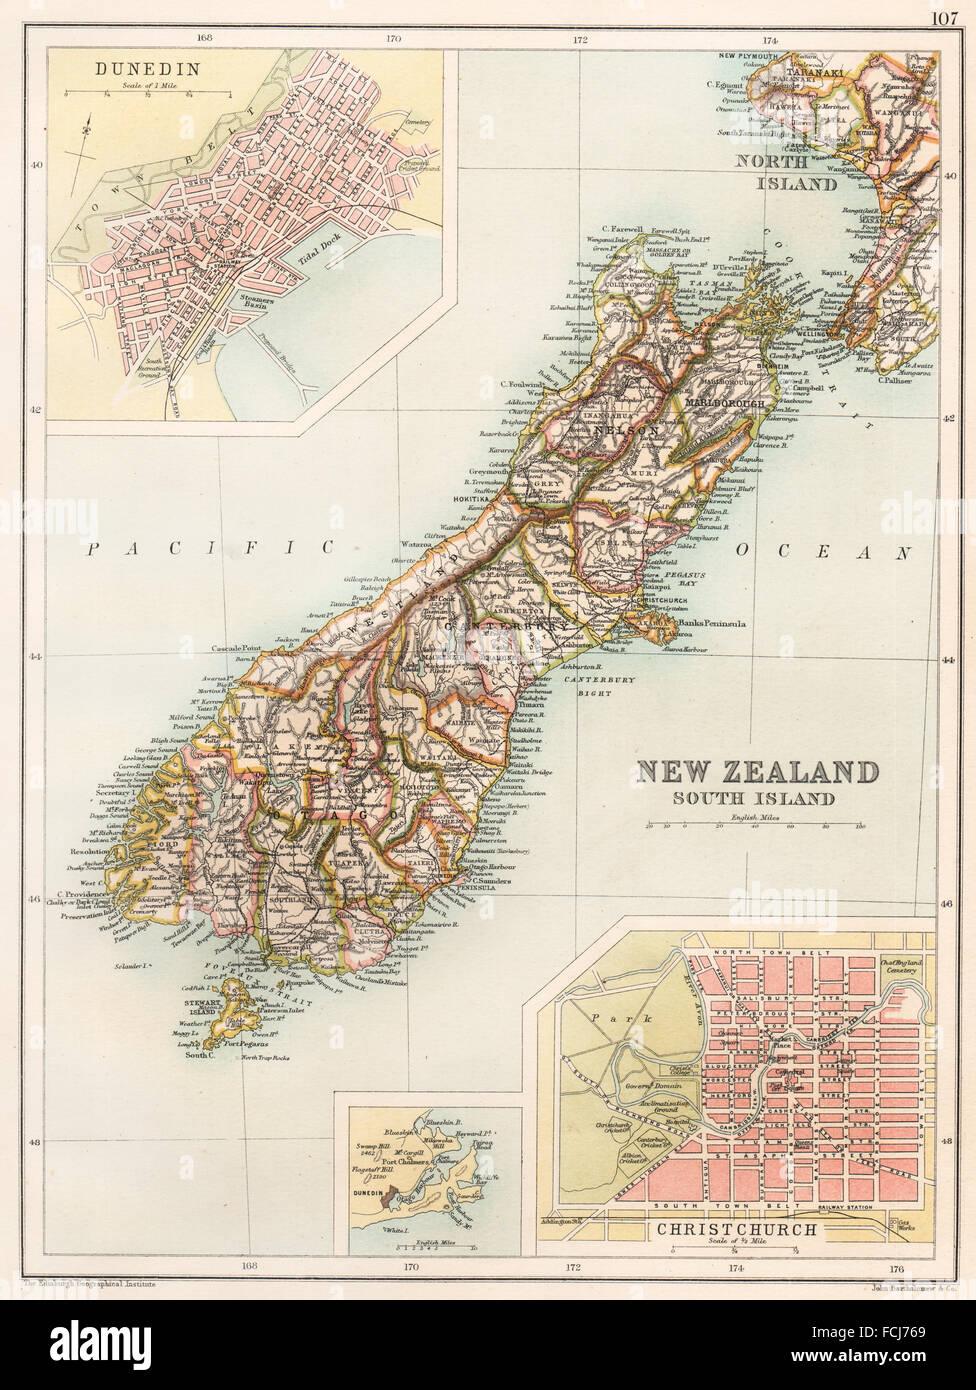 New Zealand South Island Showing Counties Christchurch Dunedin